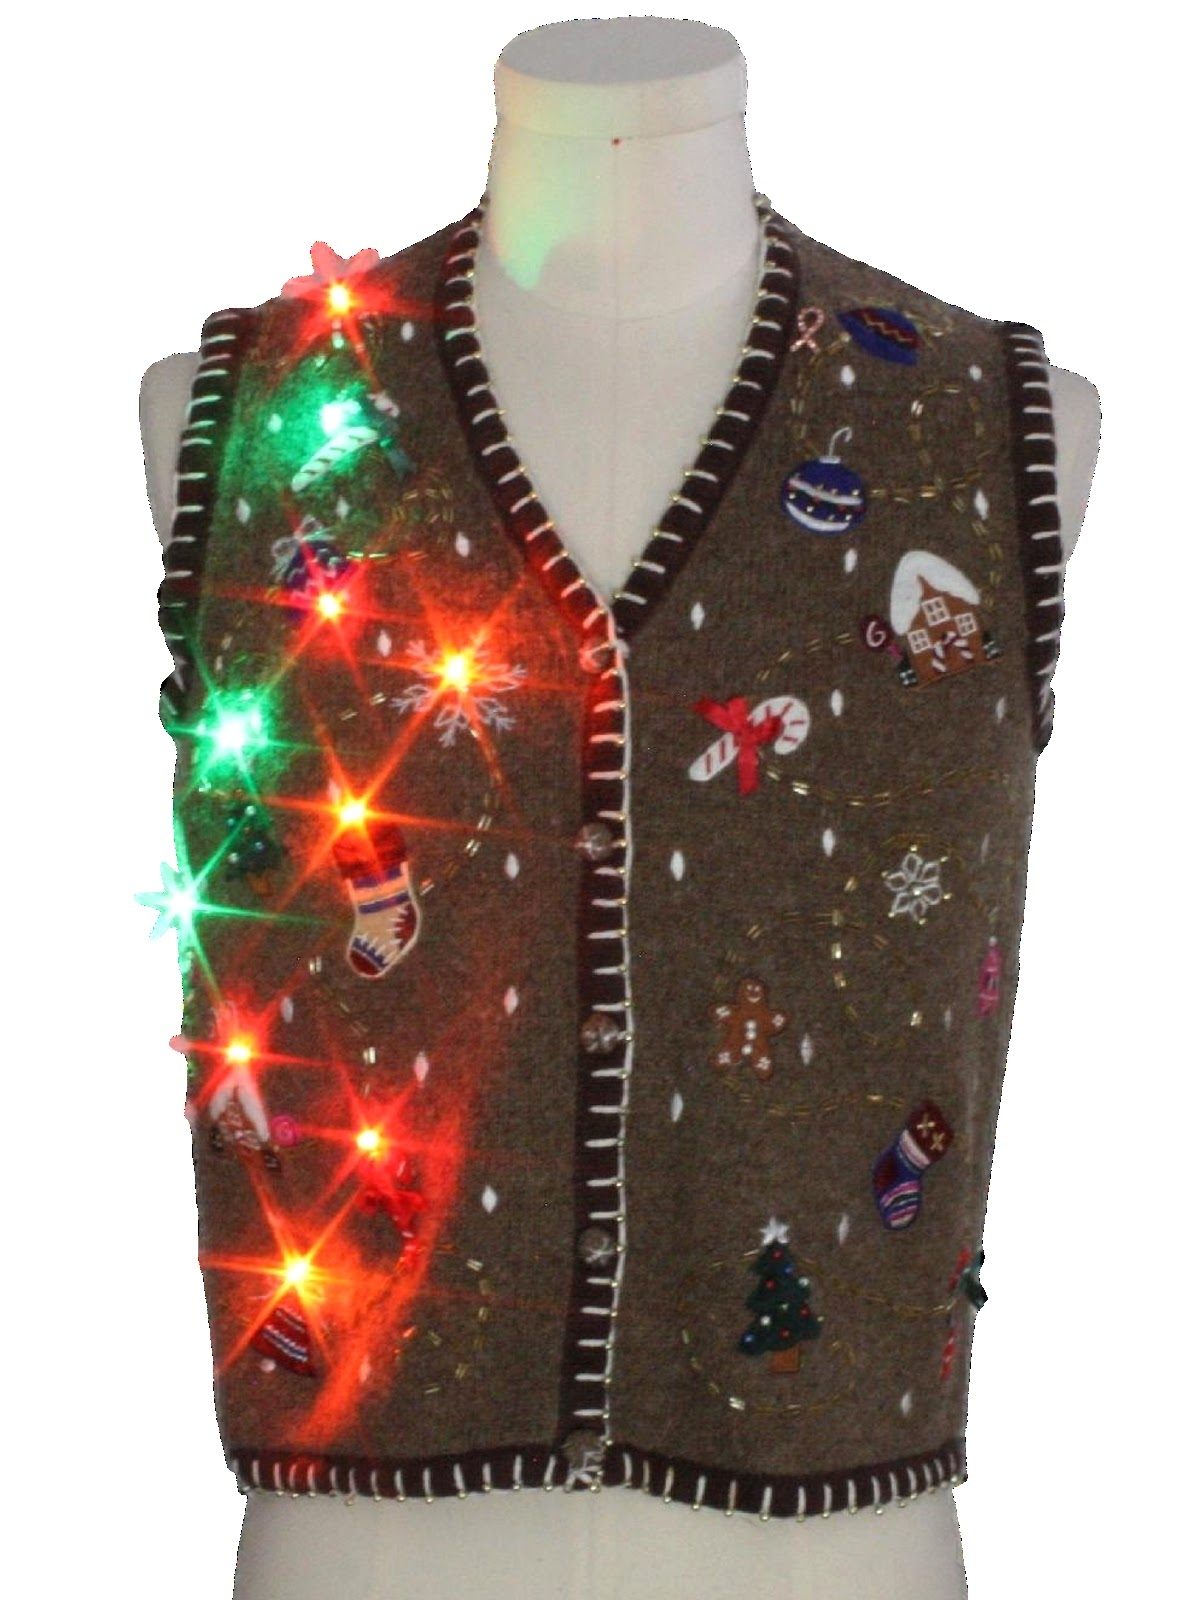 Rusty Zipper's holiday vest